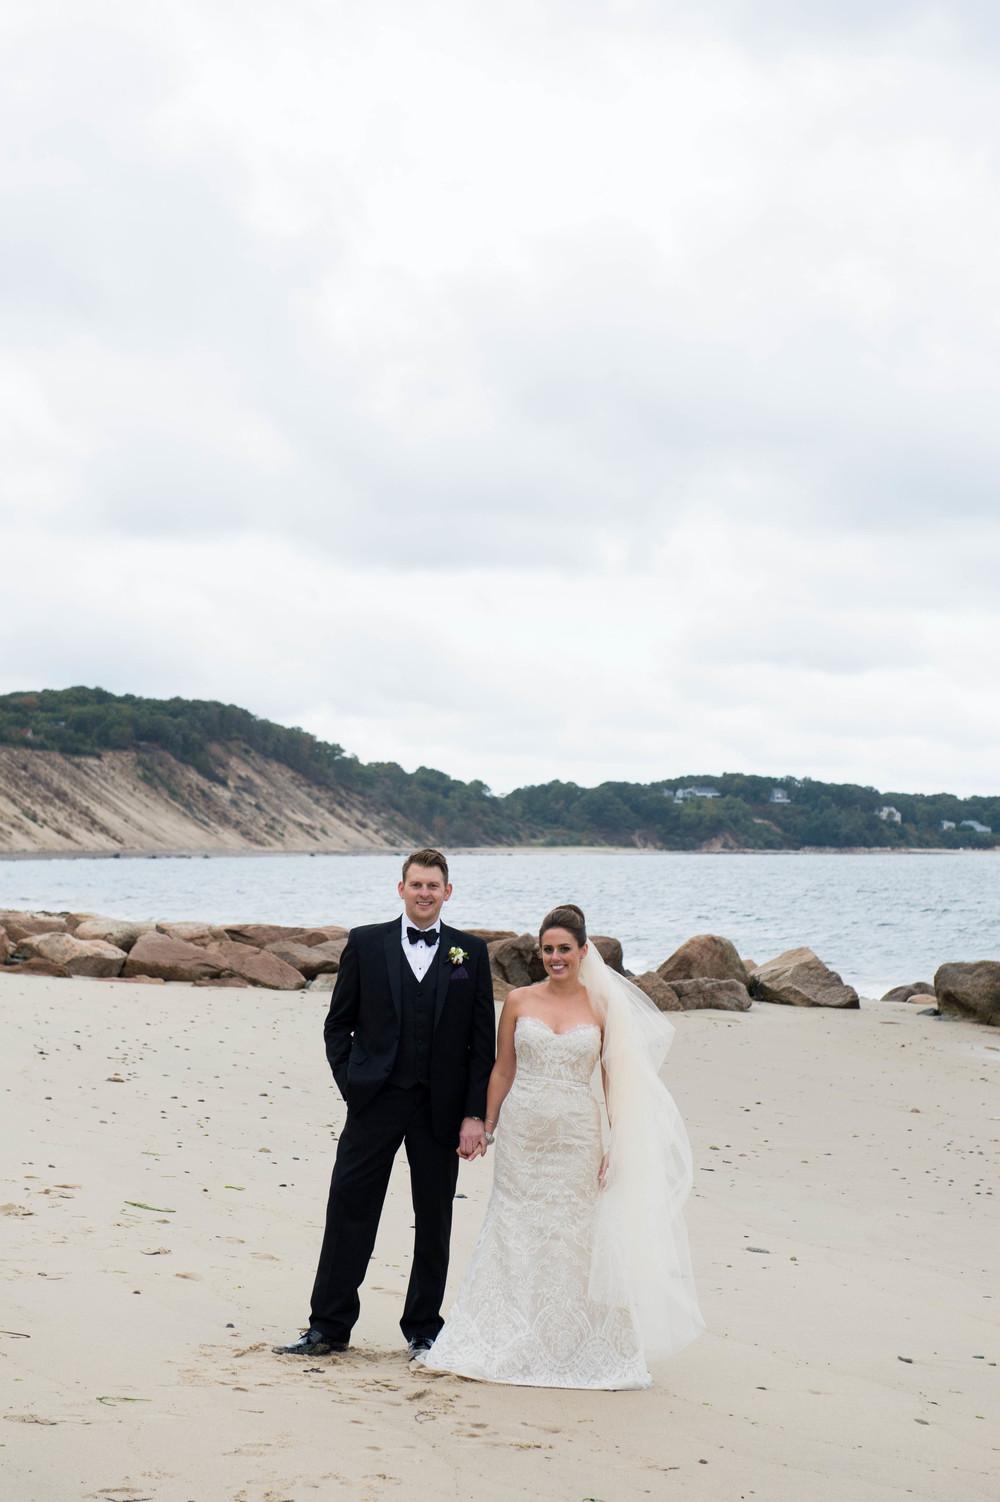 White_Cliffs_Plymouth_Wedding-38.jpg